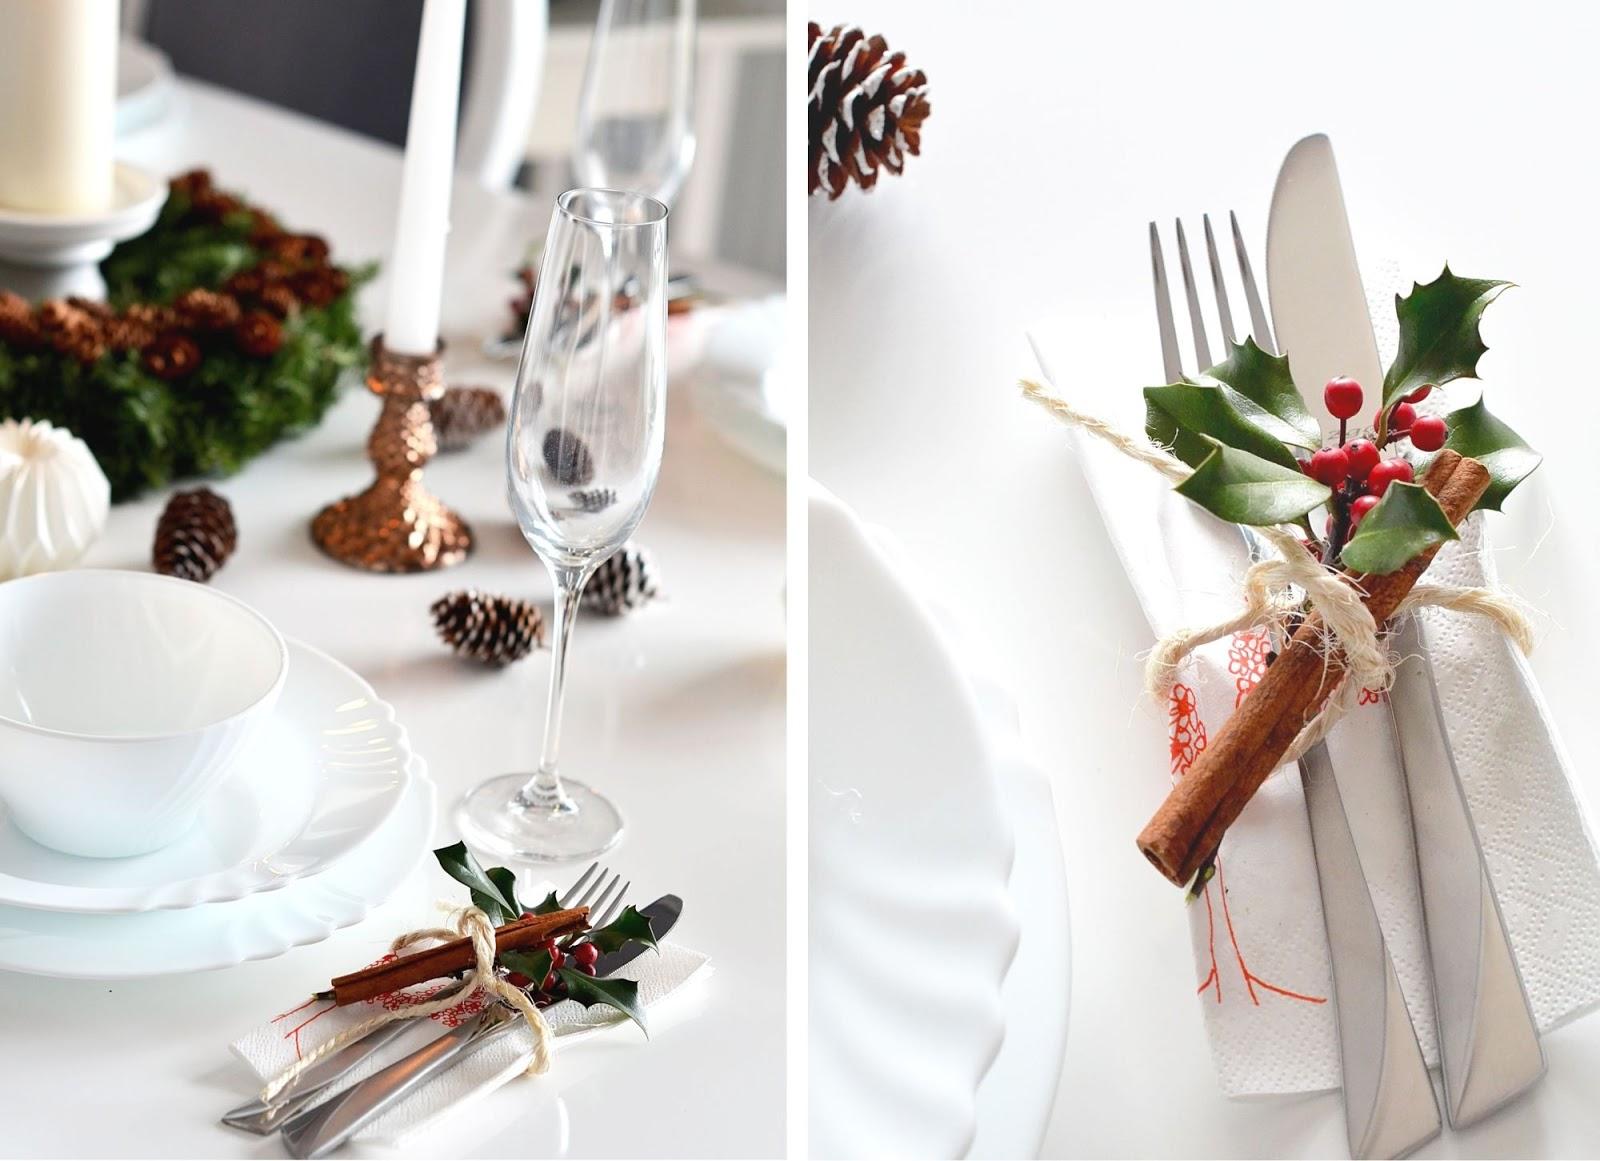 pomysly na tanie przystrojnie stolu | blog moda | uroda | wnetrza | cammy blog